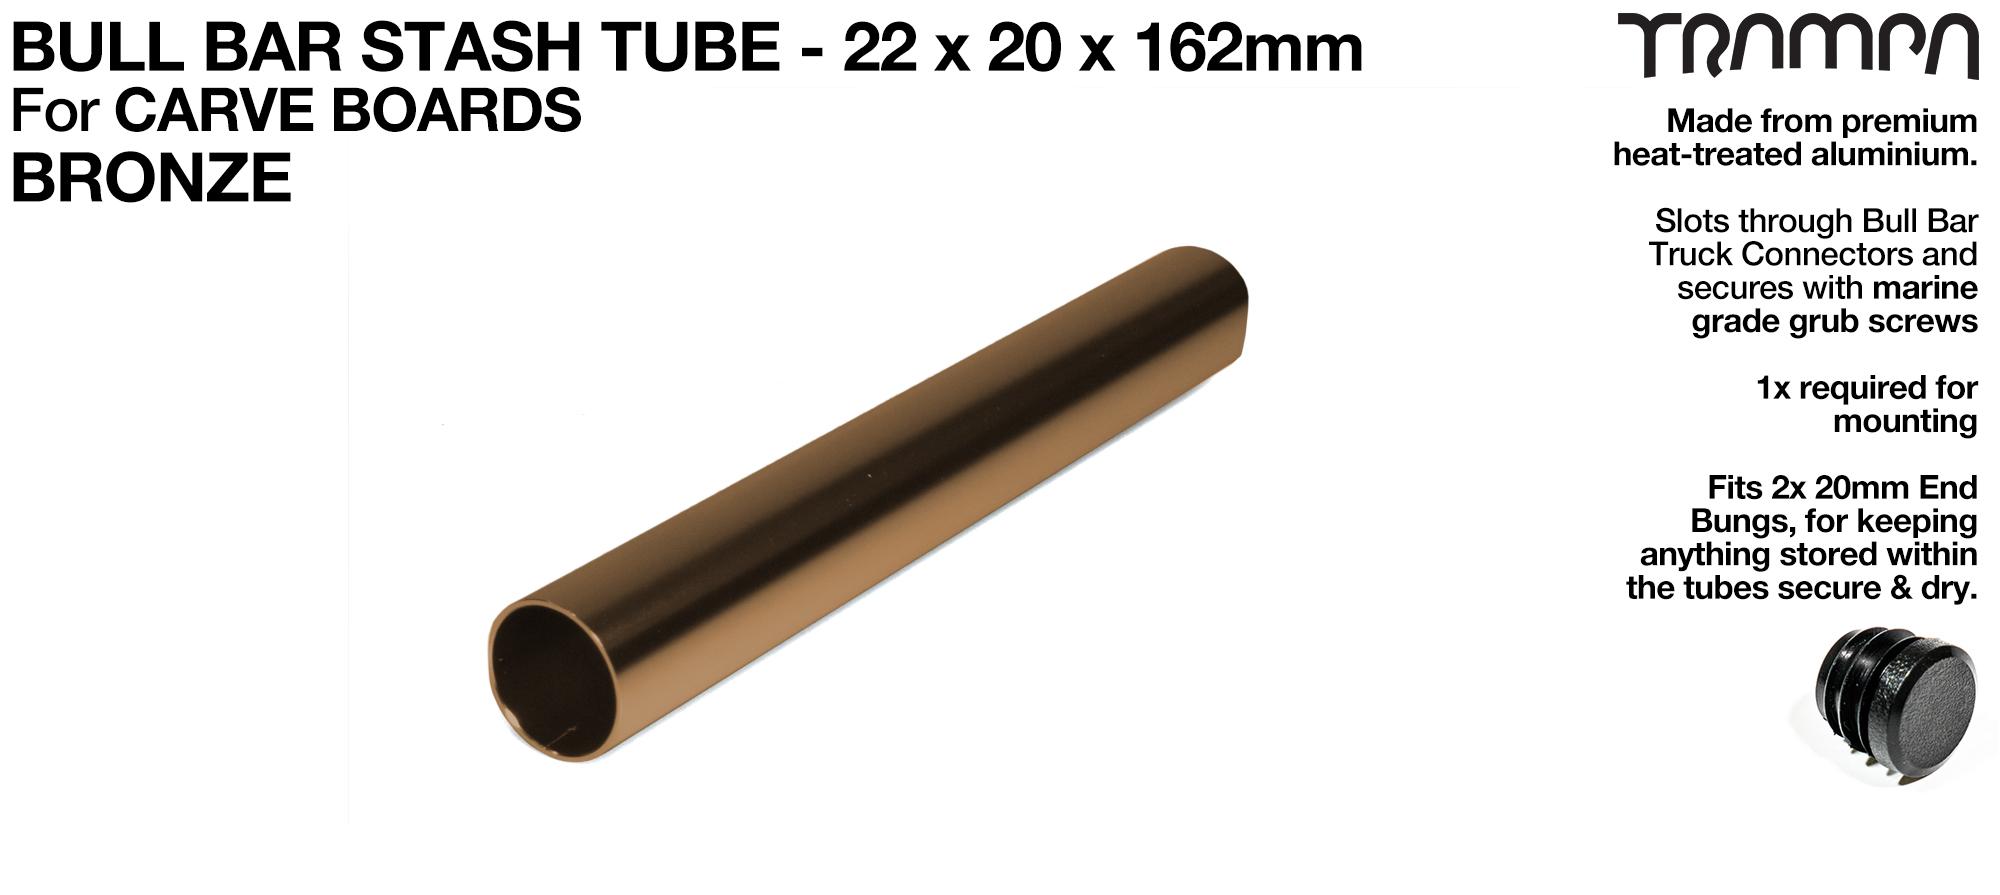 Carve Board Bull Bar Hollow Aluminium Stash Tube - BRONZE 22 x 20 x 162 mm